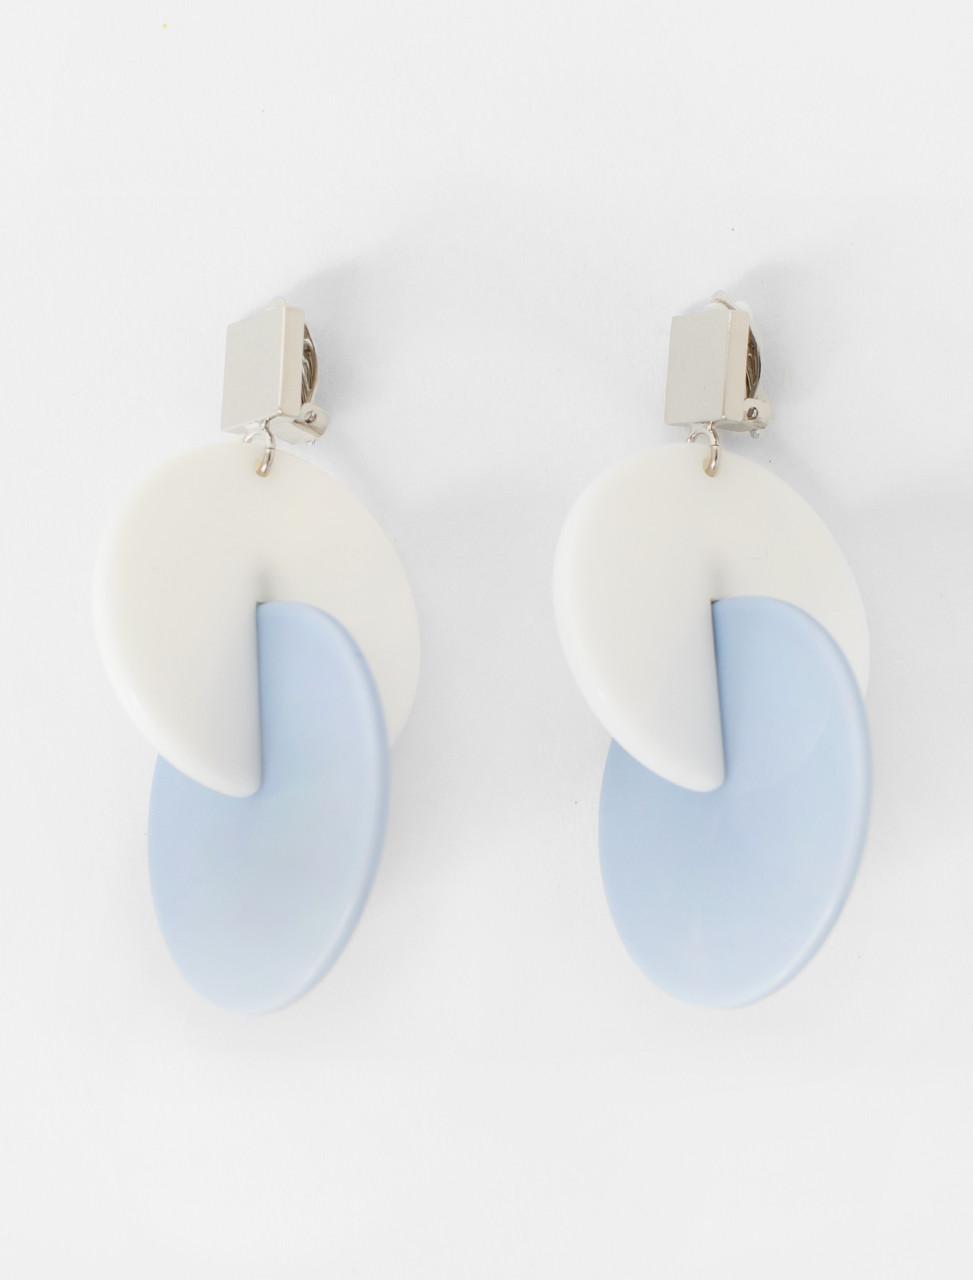 Resin Earrings in Sky Blue